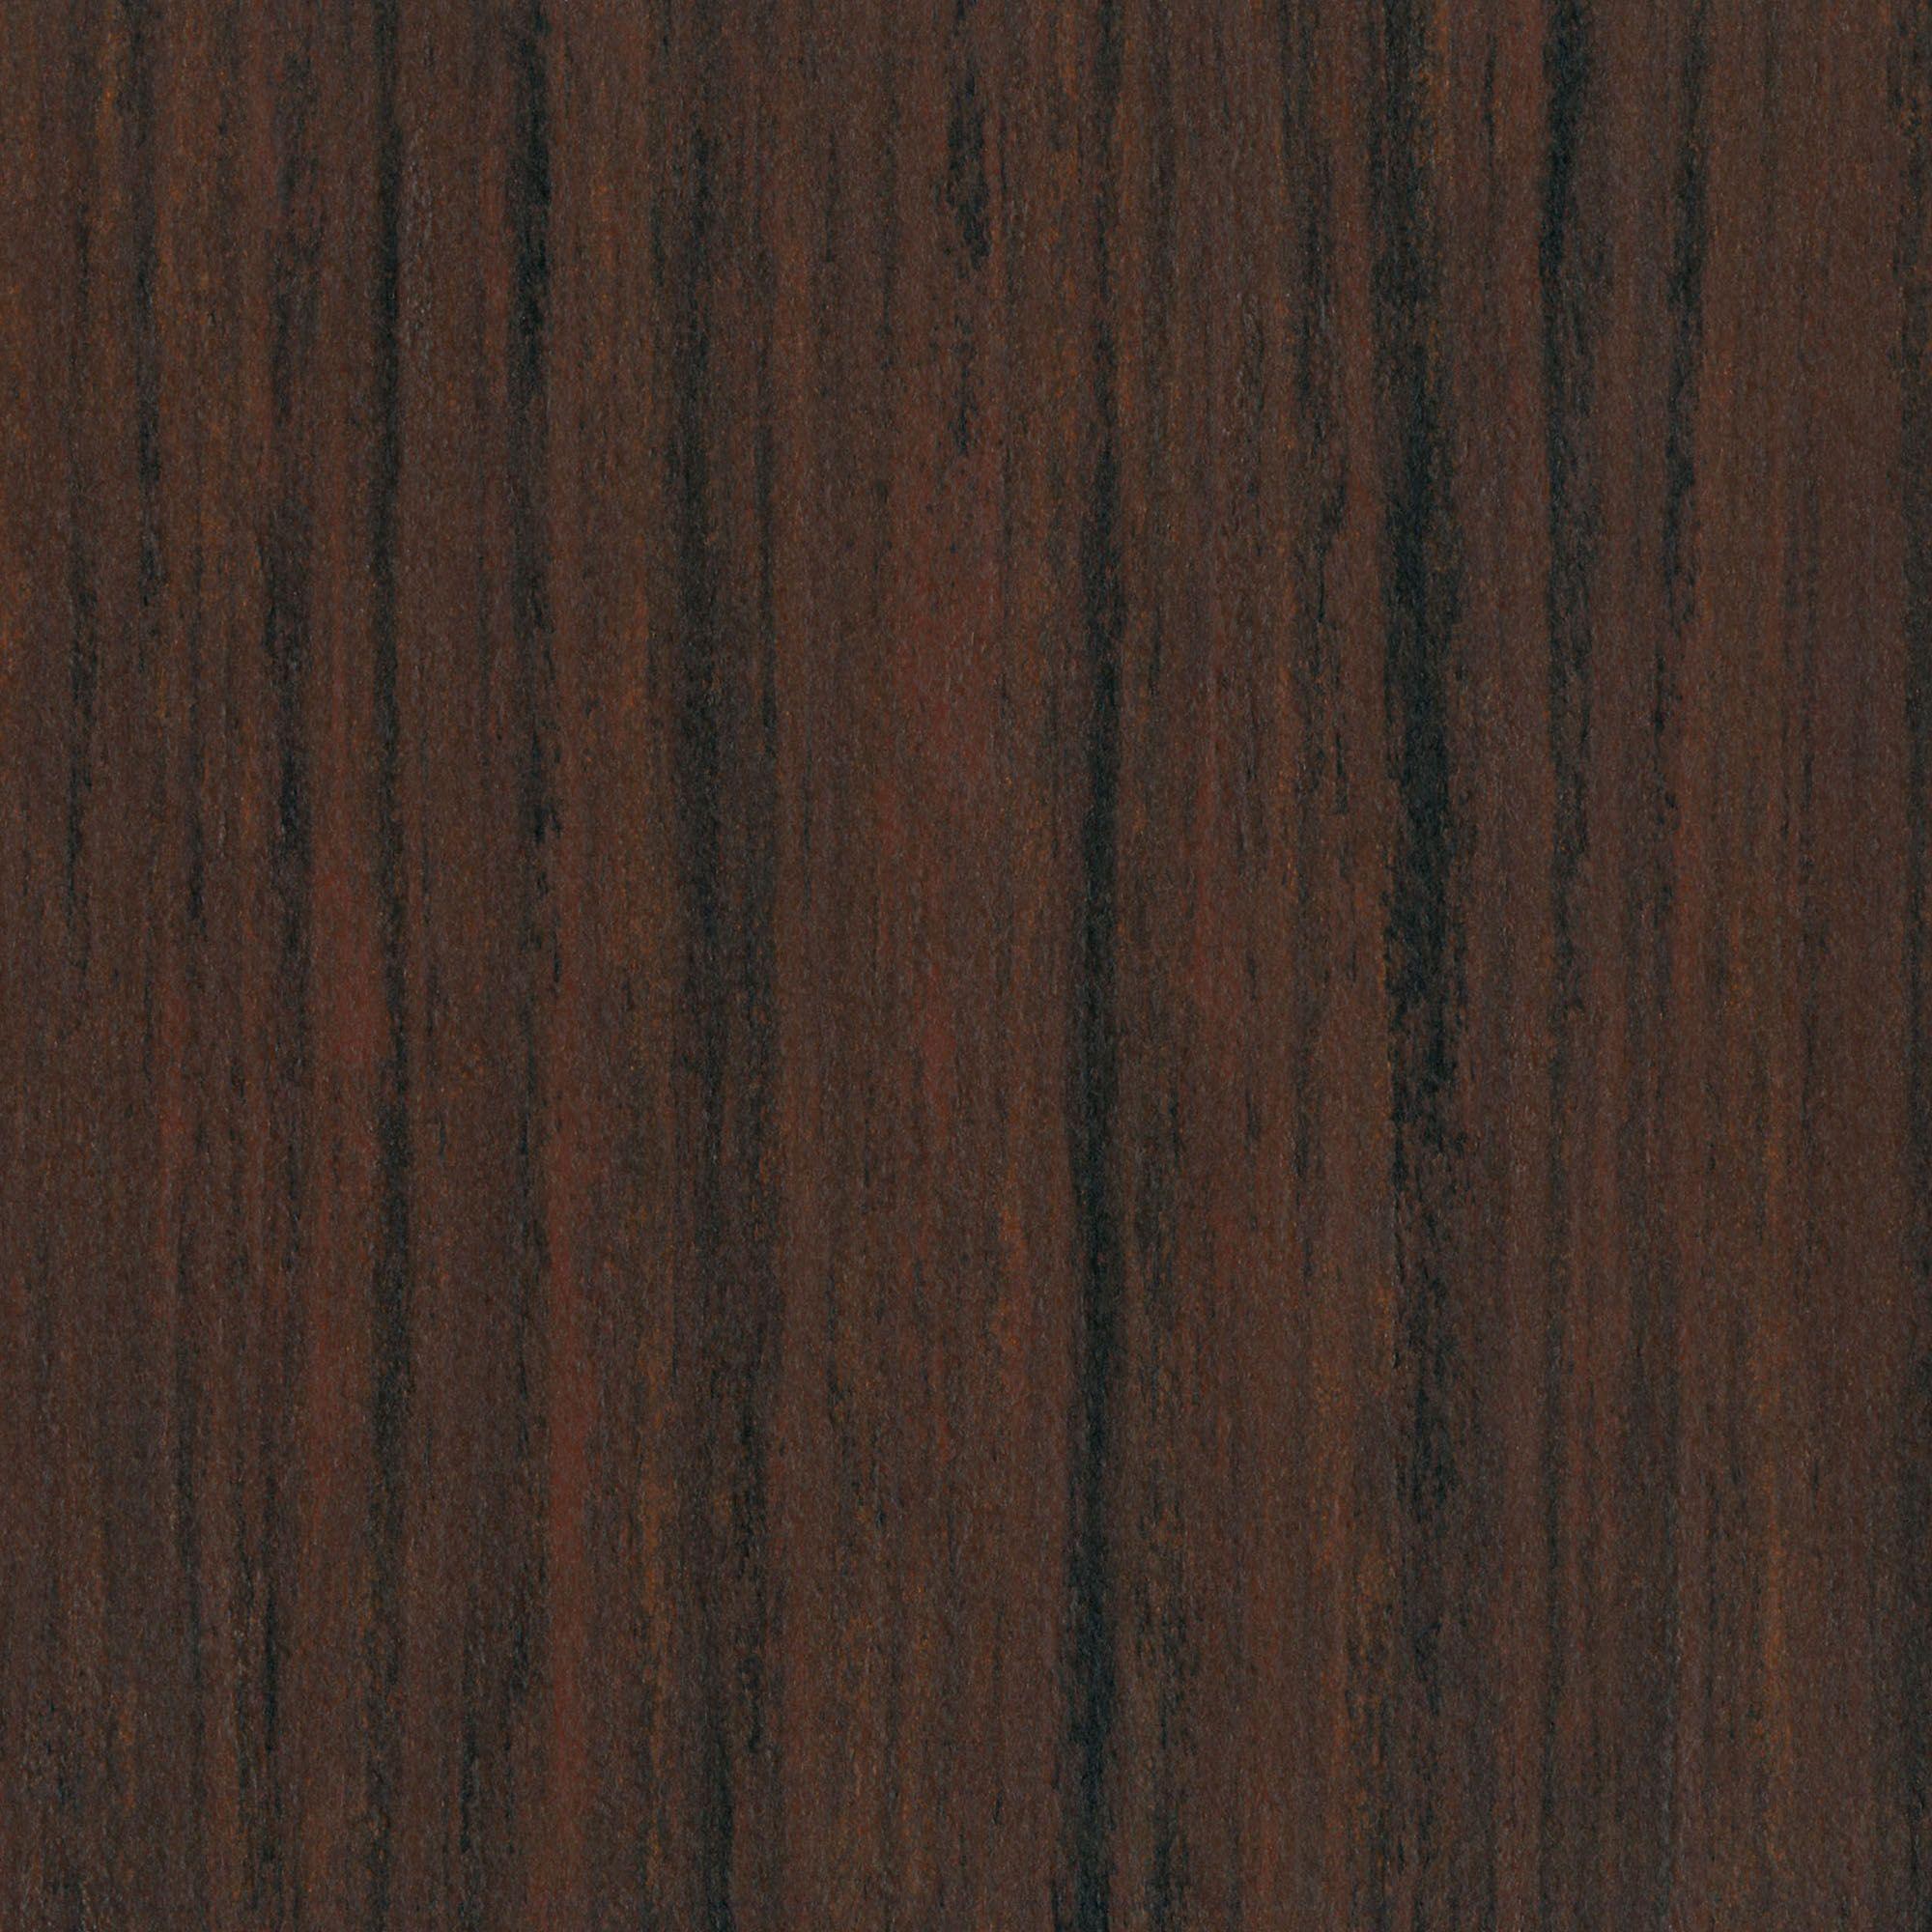 Paletar pentru linoleum Colectia Lino Art Linea ARMSTRONG - Poza 6